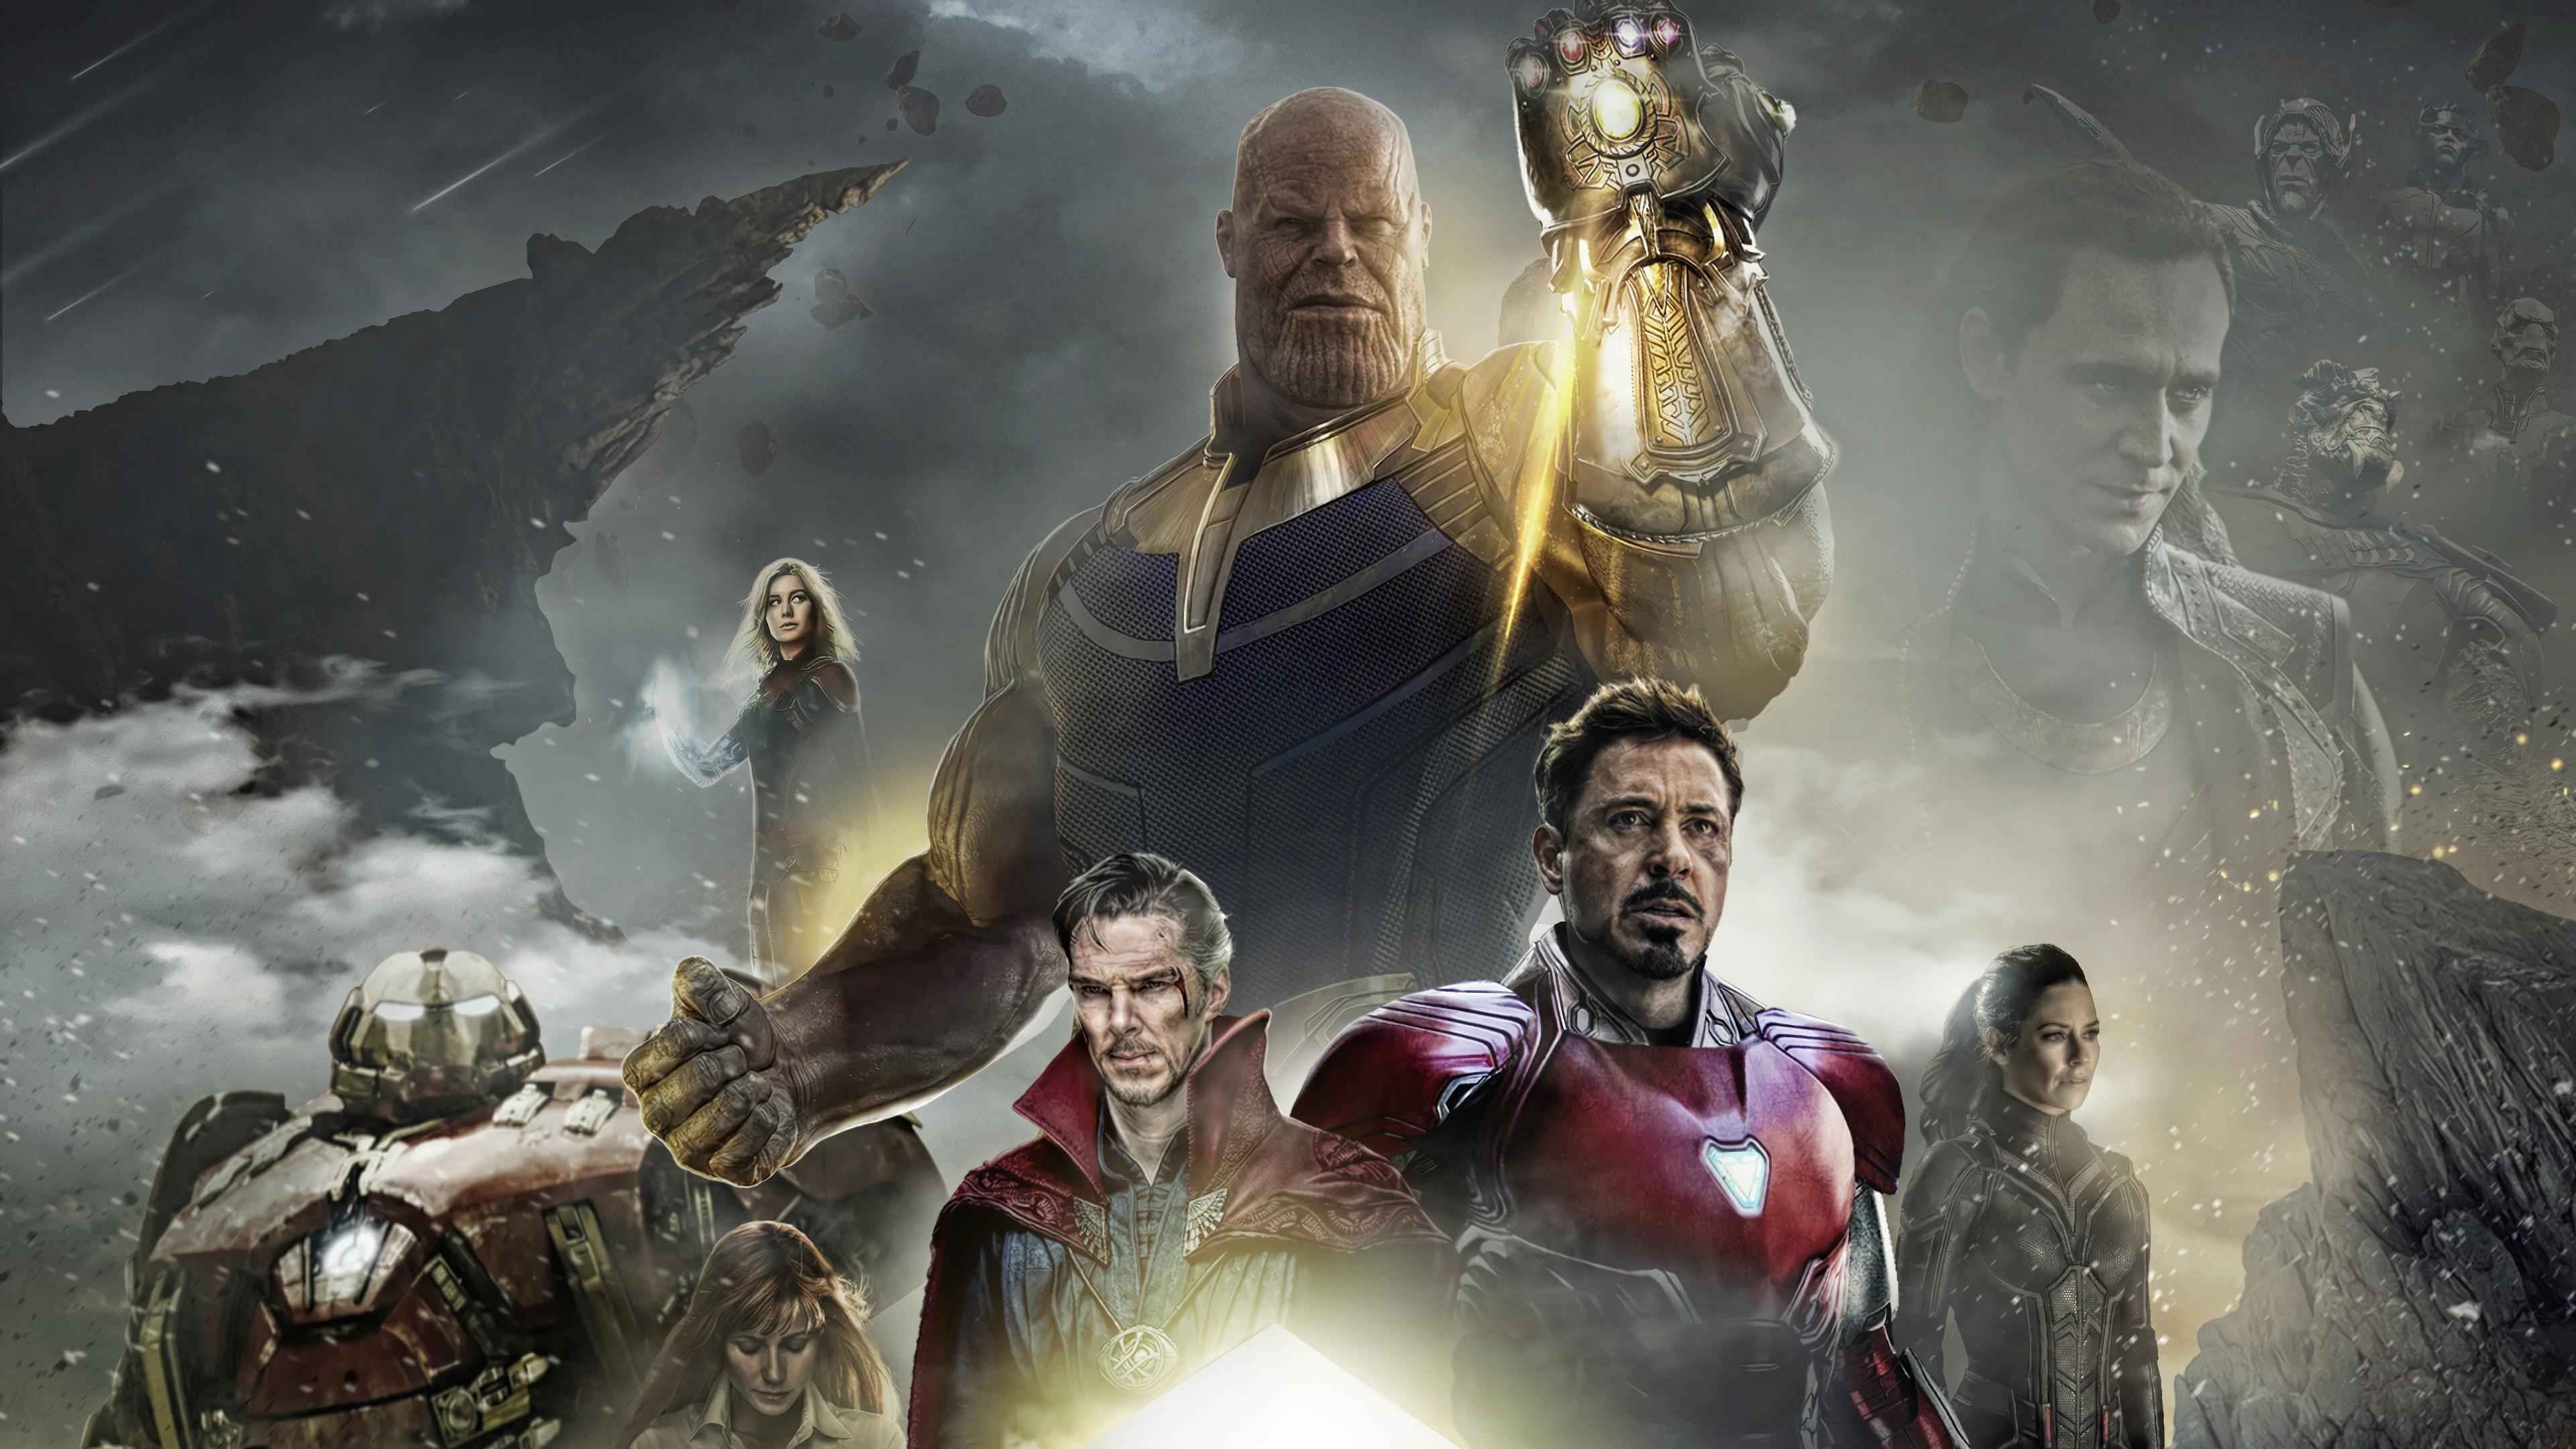 avengers infinity war thanos iron man doctor strange 4k 1547507365 - Avengers: Infinity War Thanos Iron Man Doctor Strange 4K - Thanos, Iron Man, Doctor Strange, Avengers Infinity War